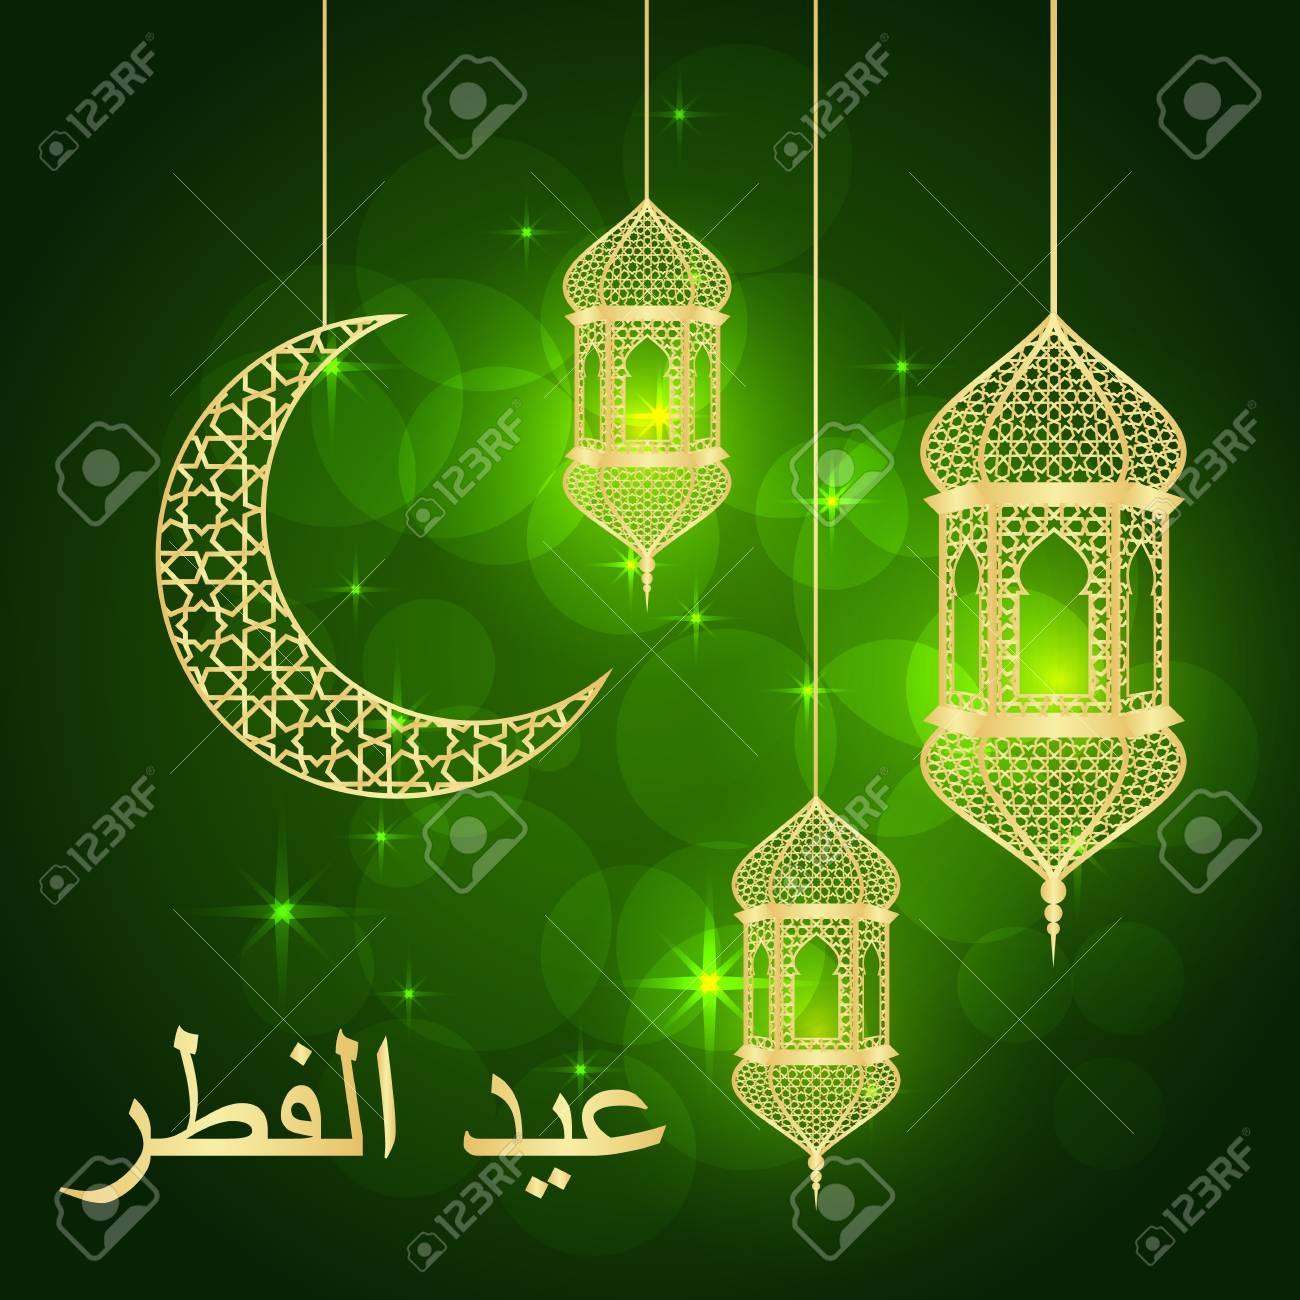 Cool Different Eid Al-Fitr Greeting - 58667506-eid-al-fitr-greeting-card-on-green-background-vector-illustration-eid-al-fitr-means-festival-of-brea  Gallery_904574 .jpg